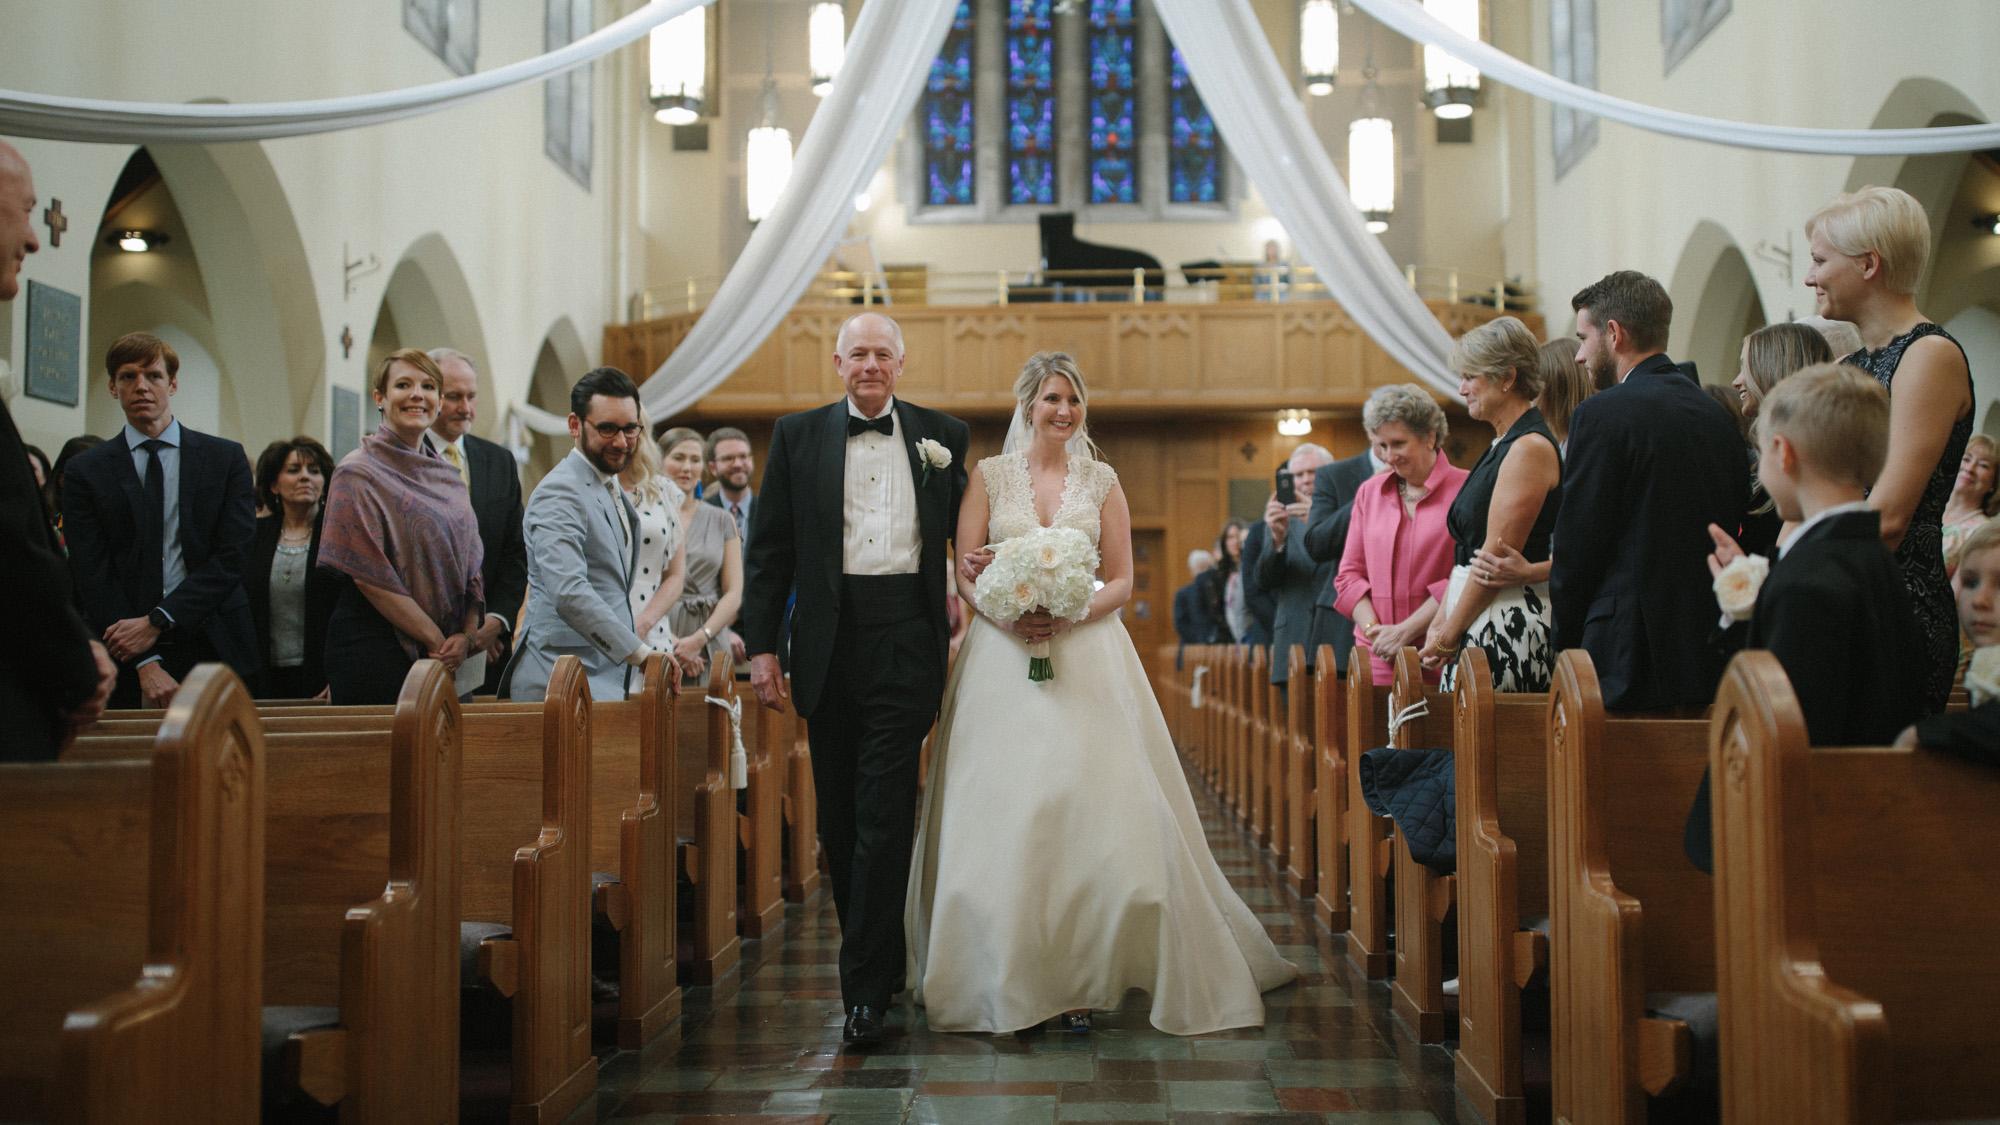 Alec_Vanderboom_kansas_city_hip_wedding_photos-0031.jpg